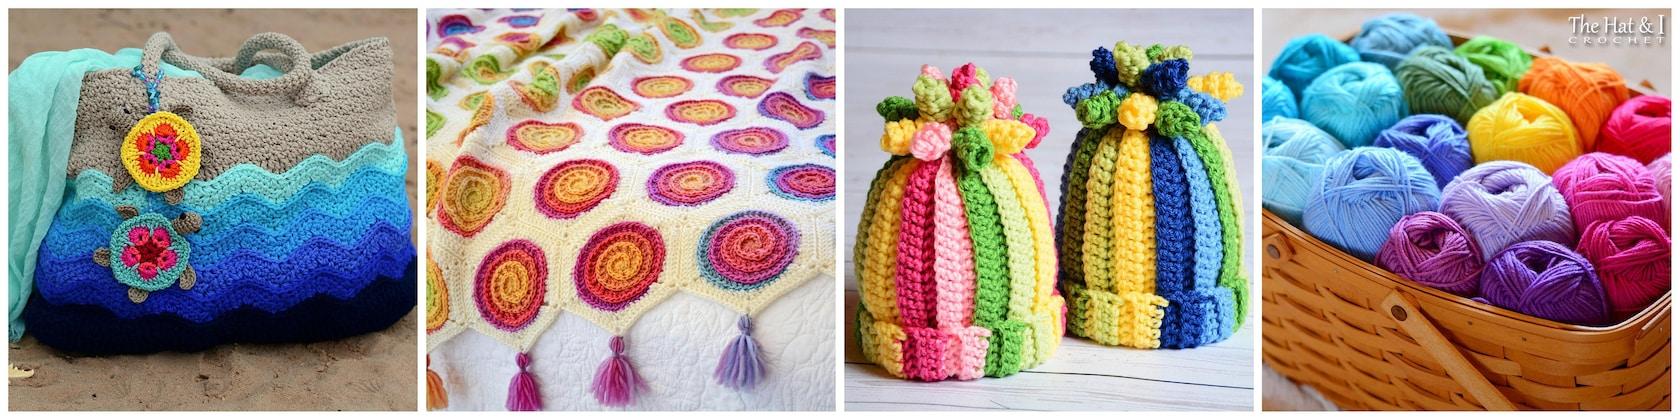 d2f86b8b13f Crochet patterns for beautiful blankets hats   more by TheHatandI